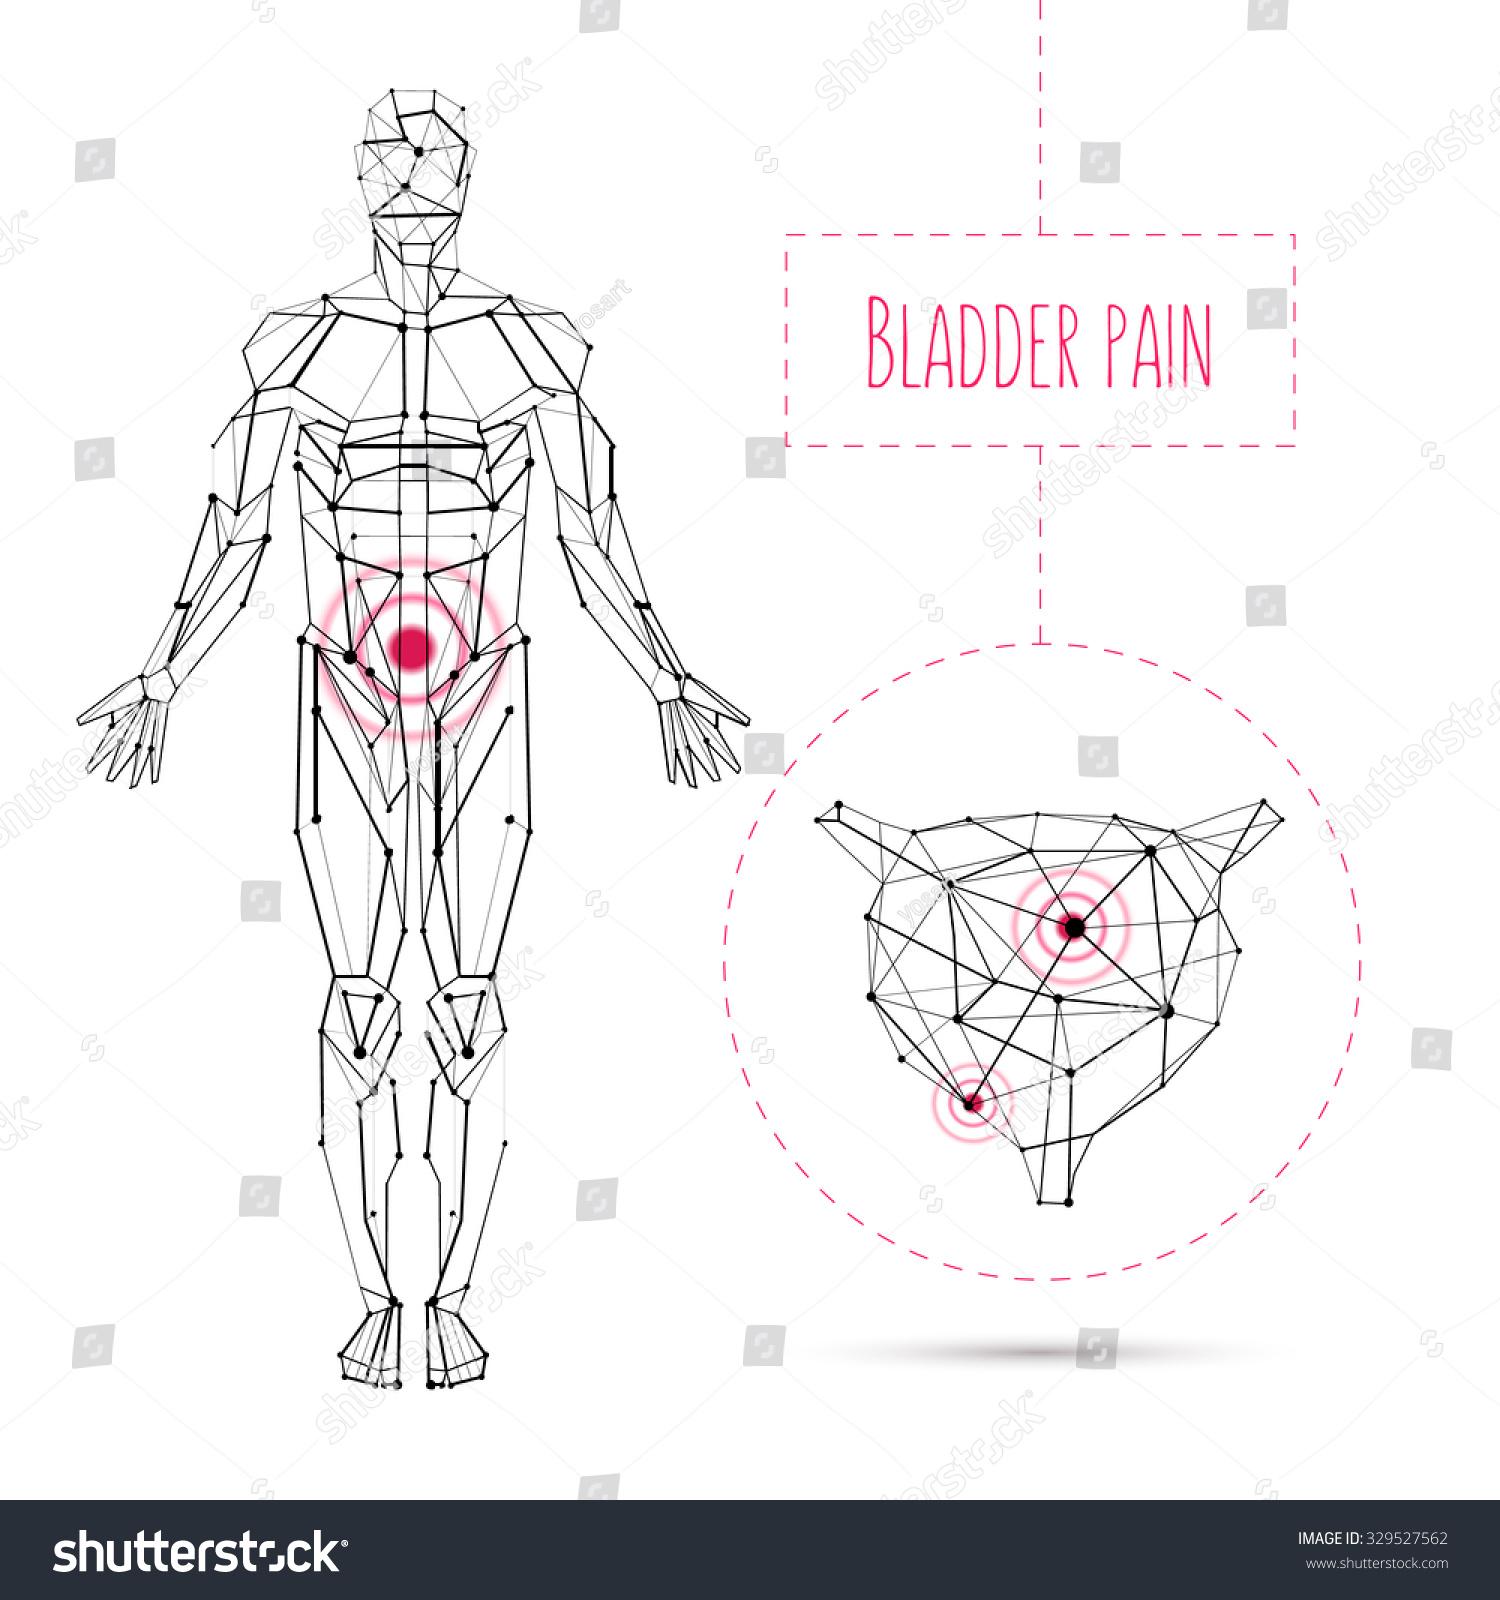 Medical Abstract Vector Human Anatomy Bladder Stock Vector (Royalty ...